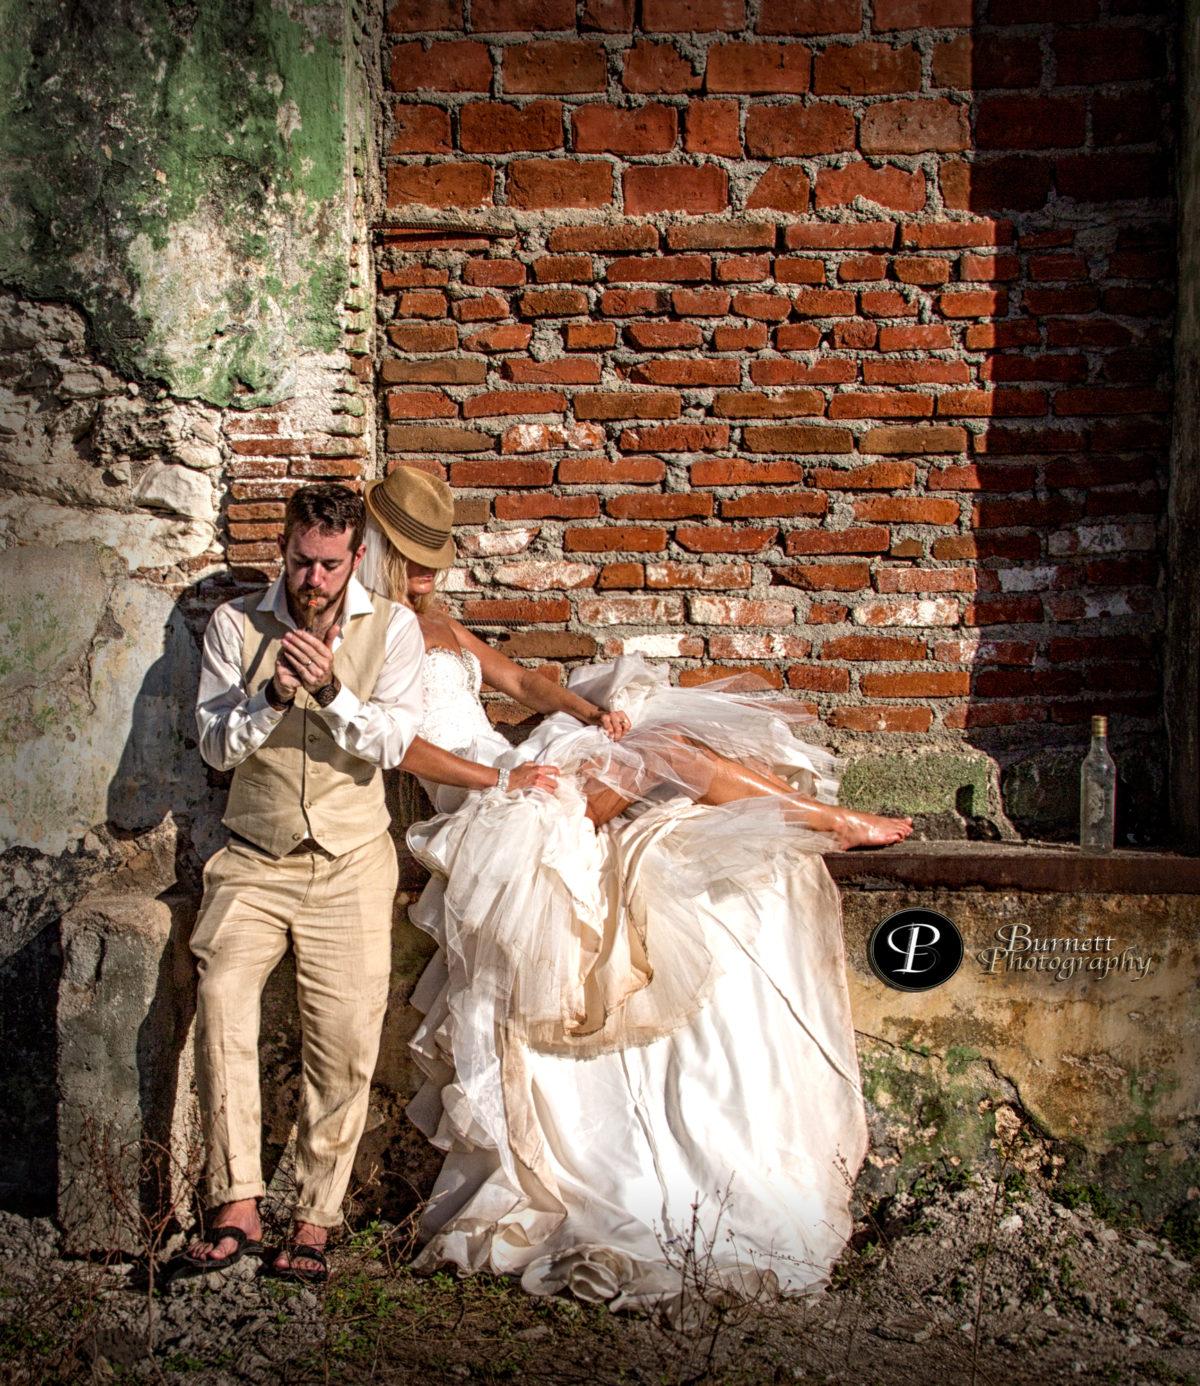 Wedding in Cuba: bride and groom Cayo Santa Maria, Cuba by Burnett Photography